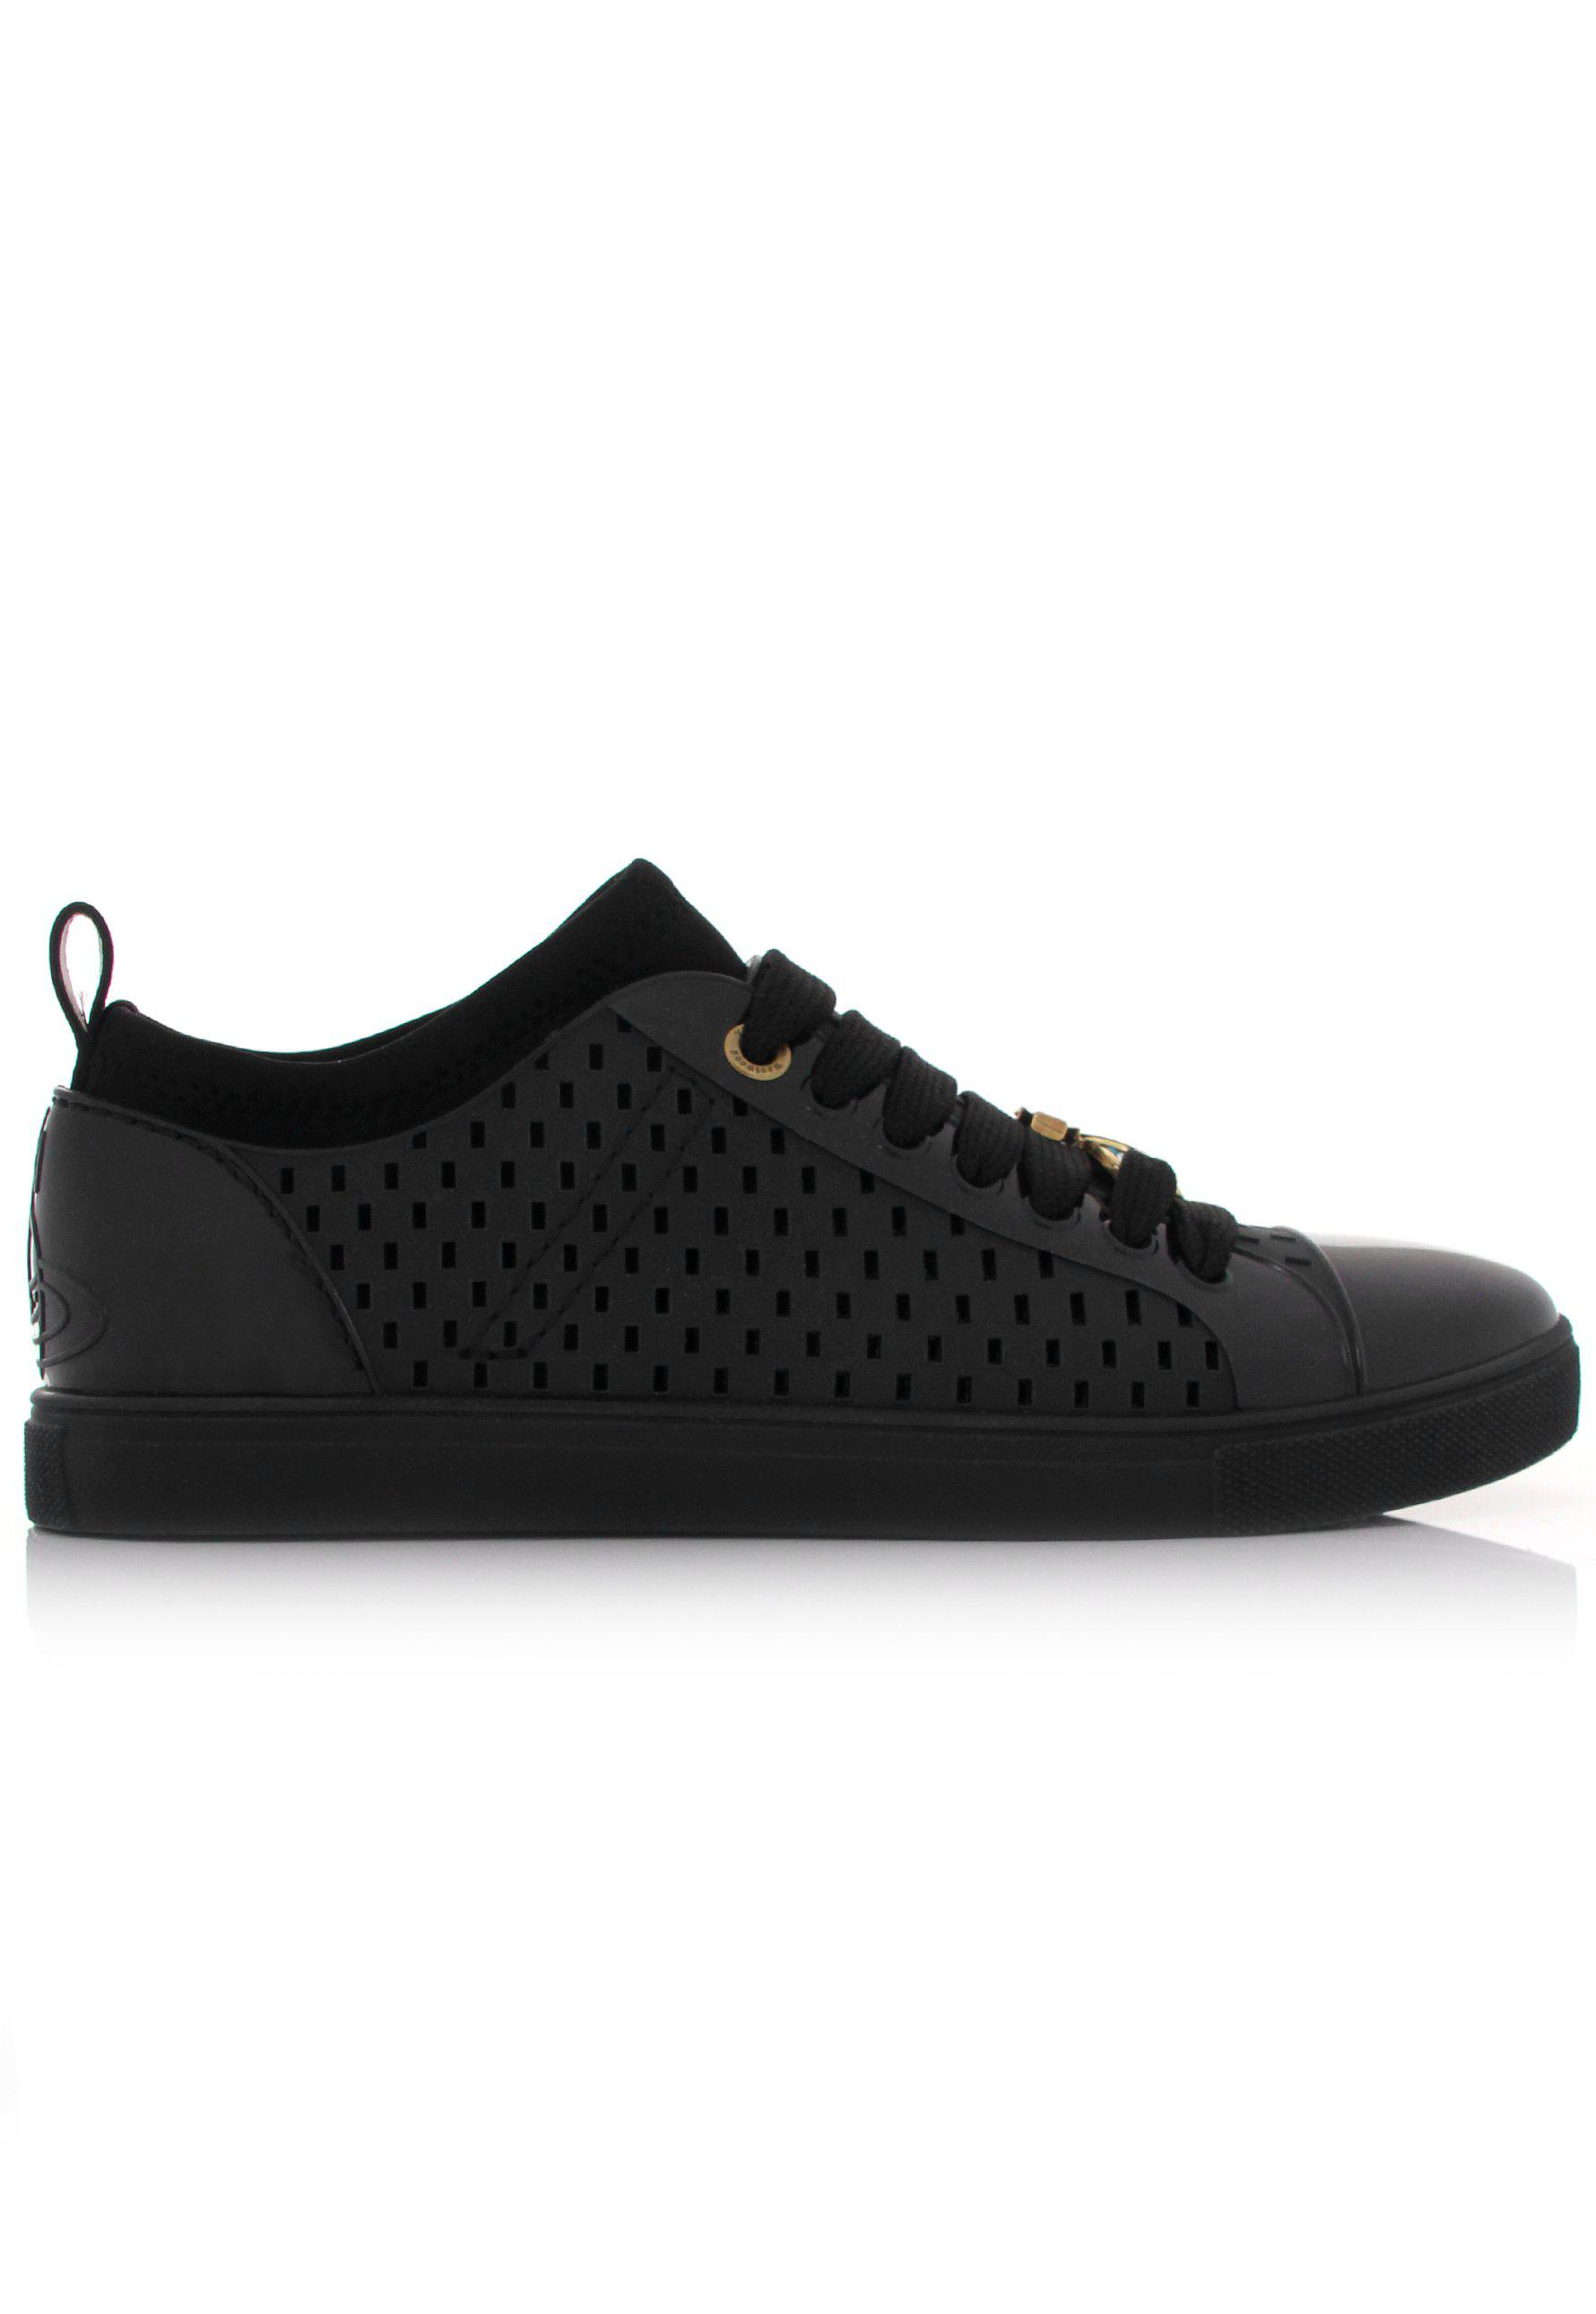 47dc2ebb0a722 Lyst - Vivienne Westwood Orb Sneakers With Sock Black in Black for Men